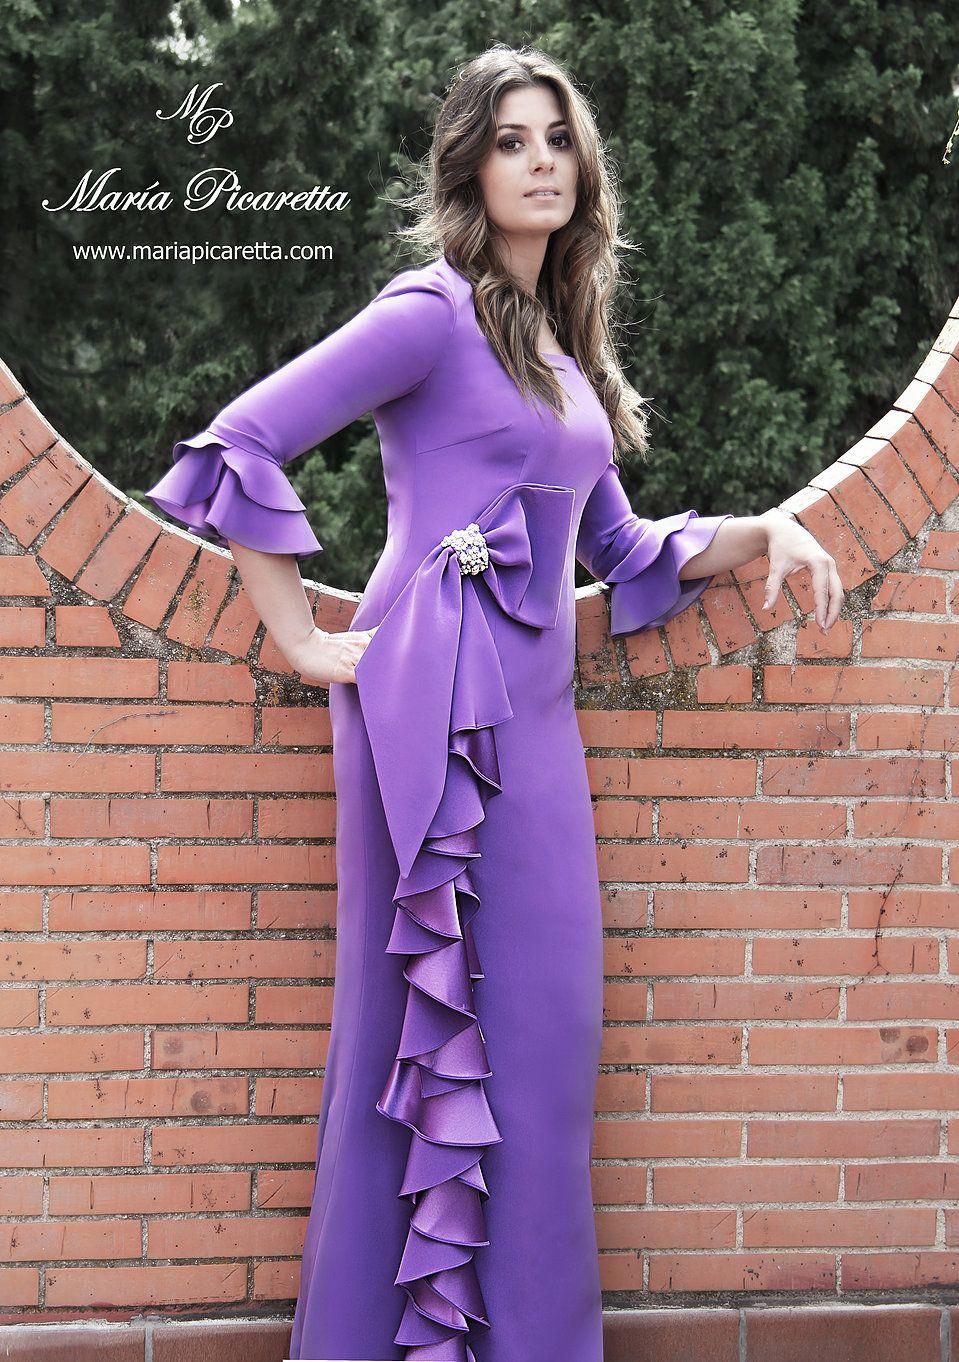 Vestidos de Fiesta. María Picaretta | Charity 17 | Pinterest ...